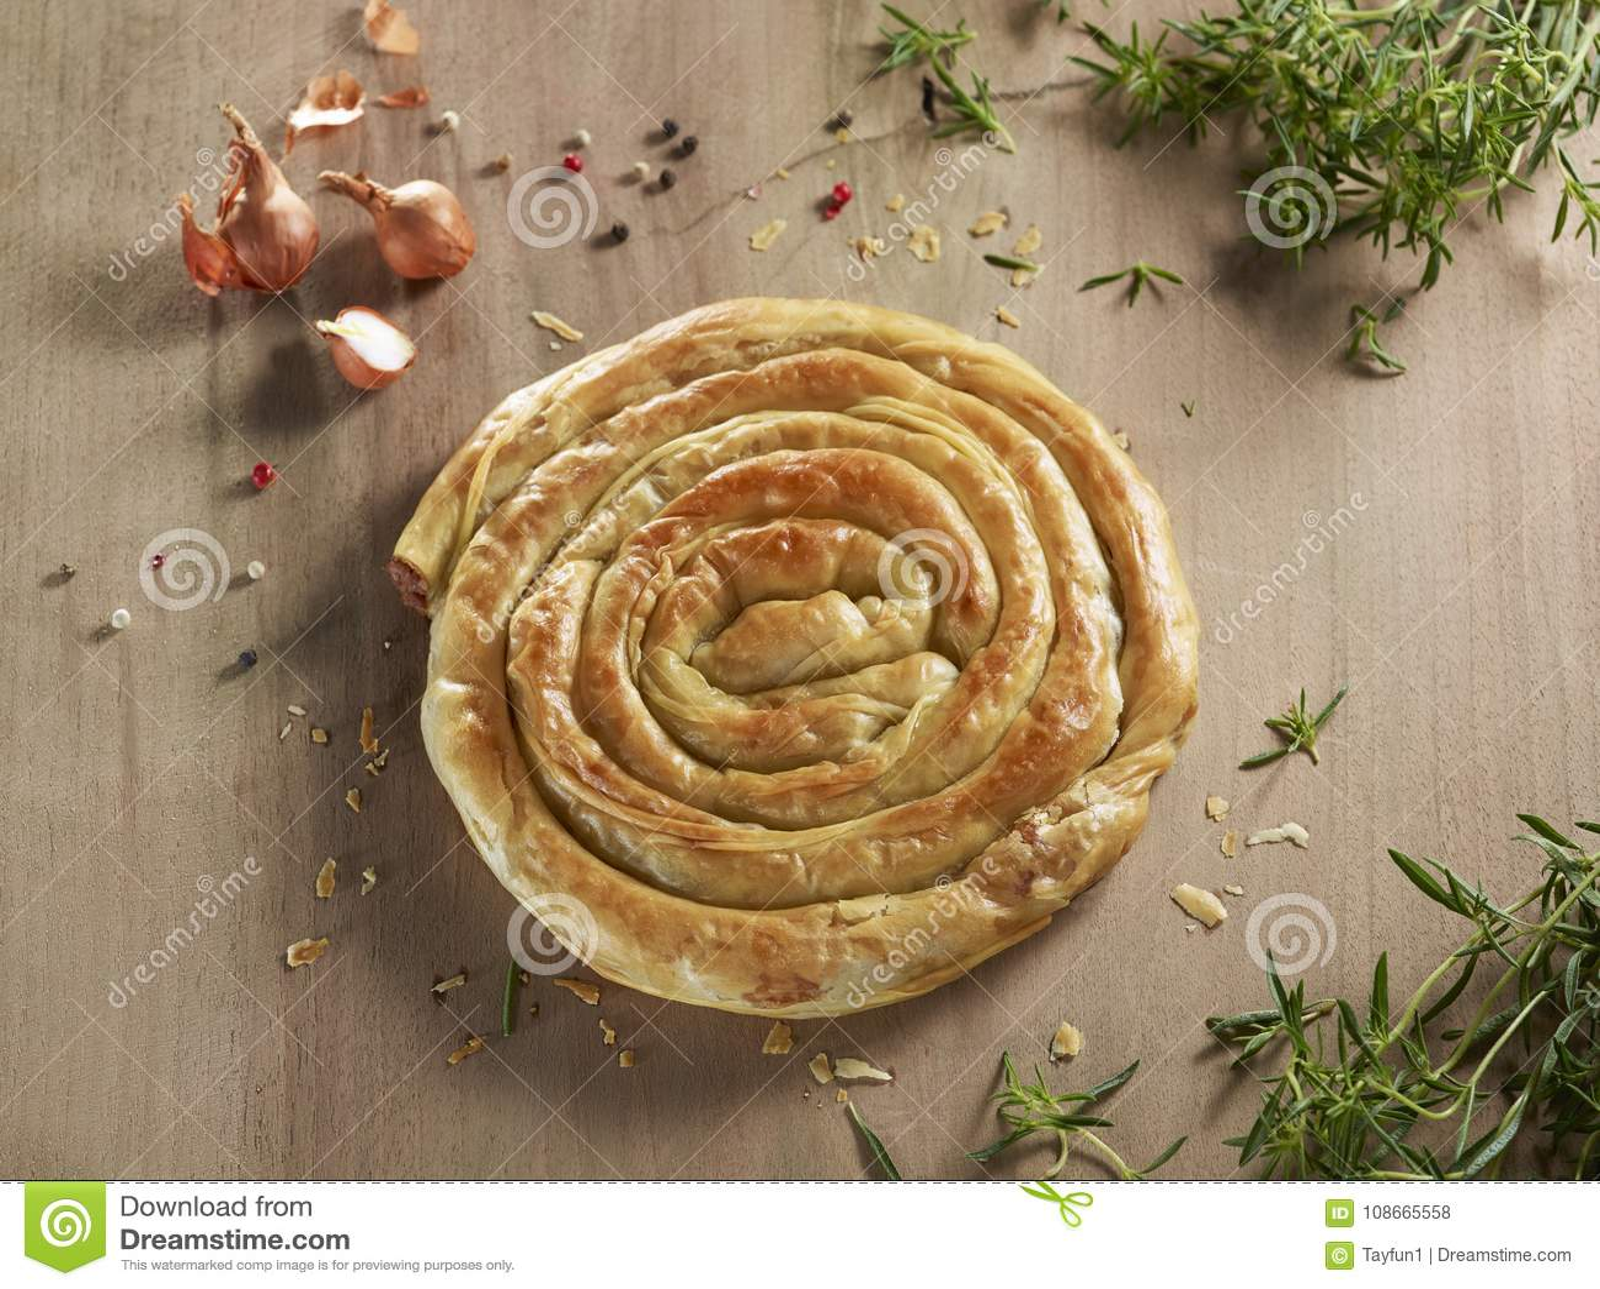 Piekarnia produktu nazwany borek, pasztecik